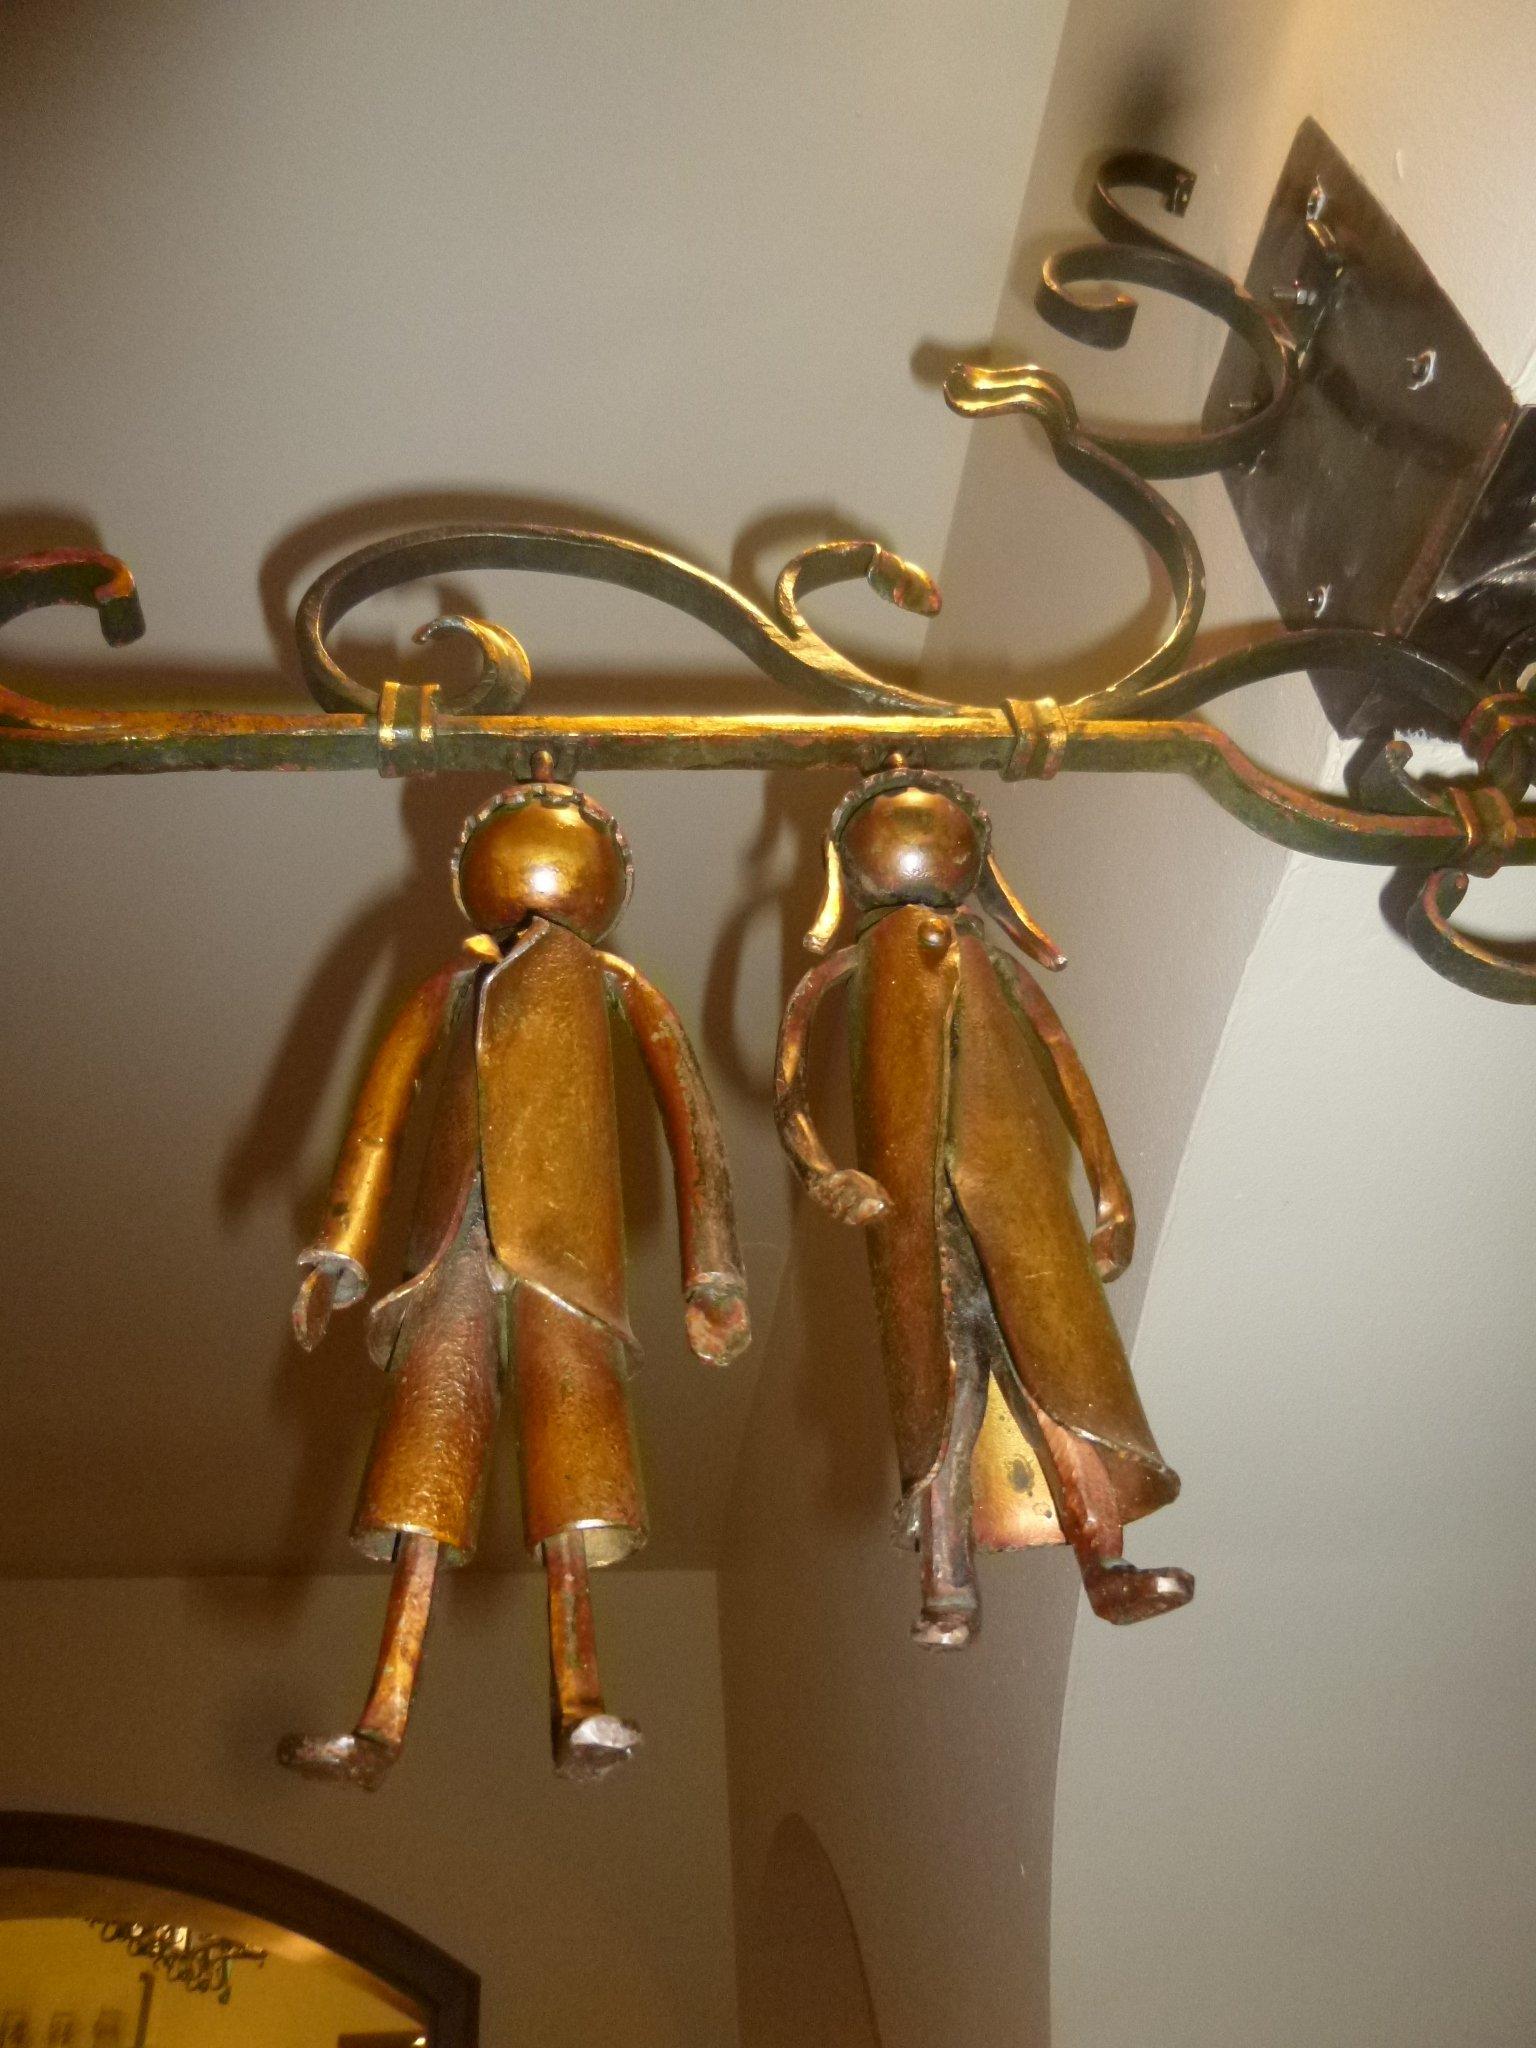 Toiletten - Figuren